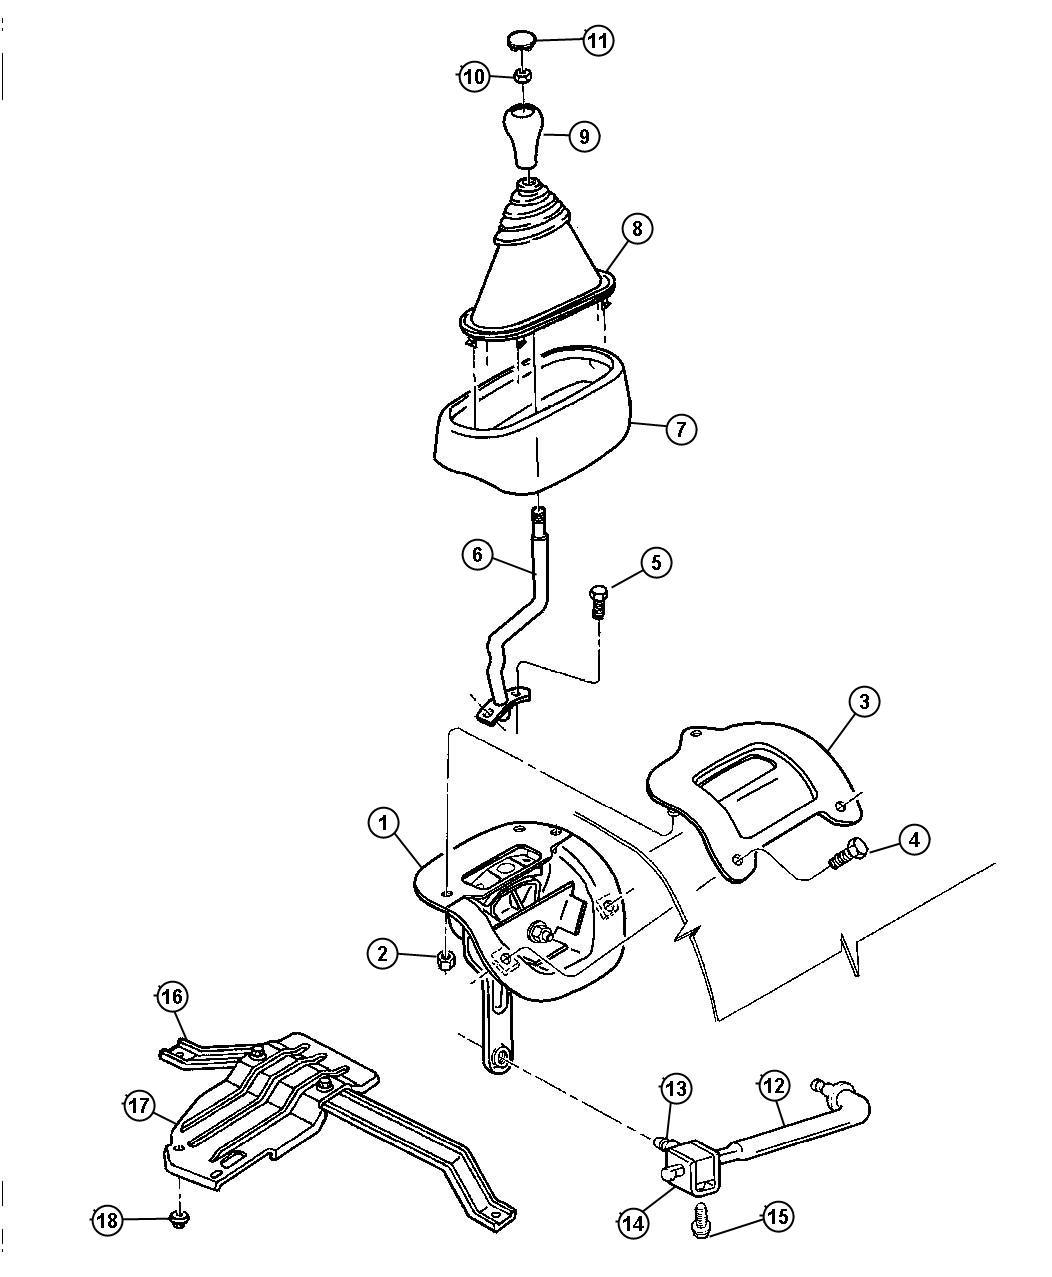 Chrysler Concorde Knob  Gearshift  Body 94  Gear Shift Lever  Gear Shift Lever